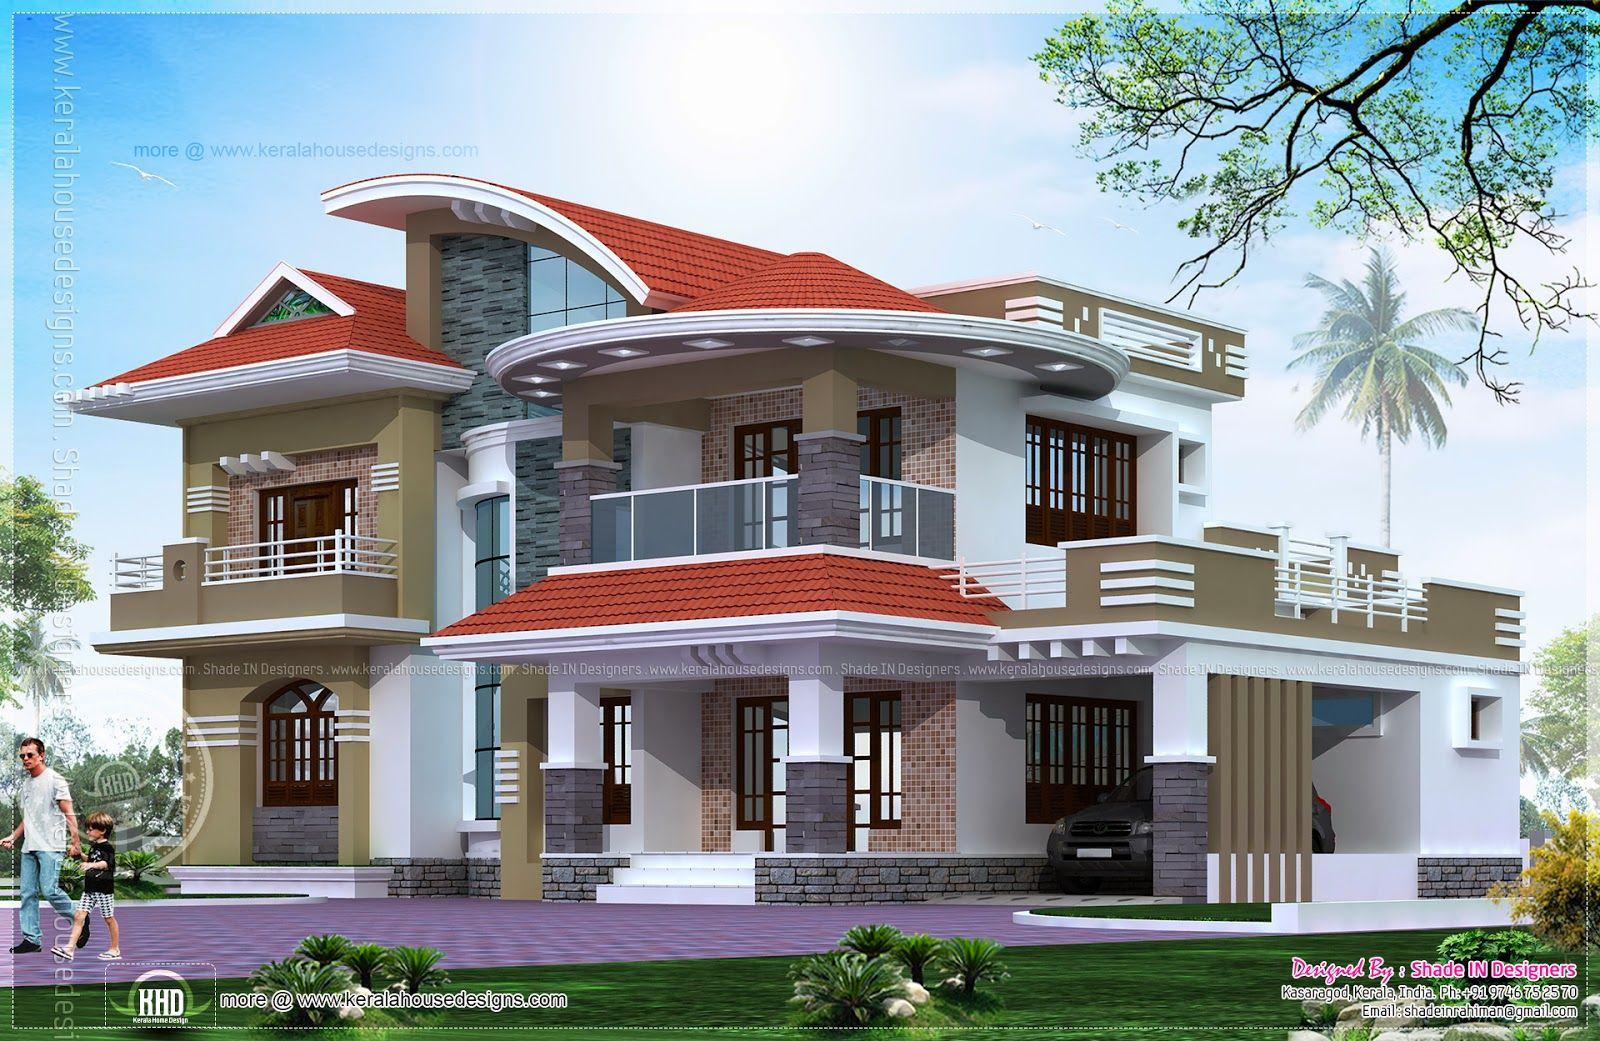 5 bedroom luxury house in kasaragod kerala house design